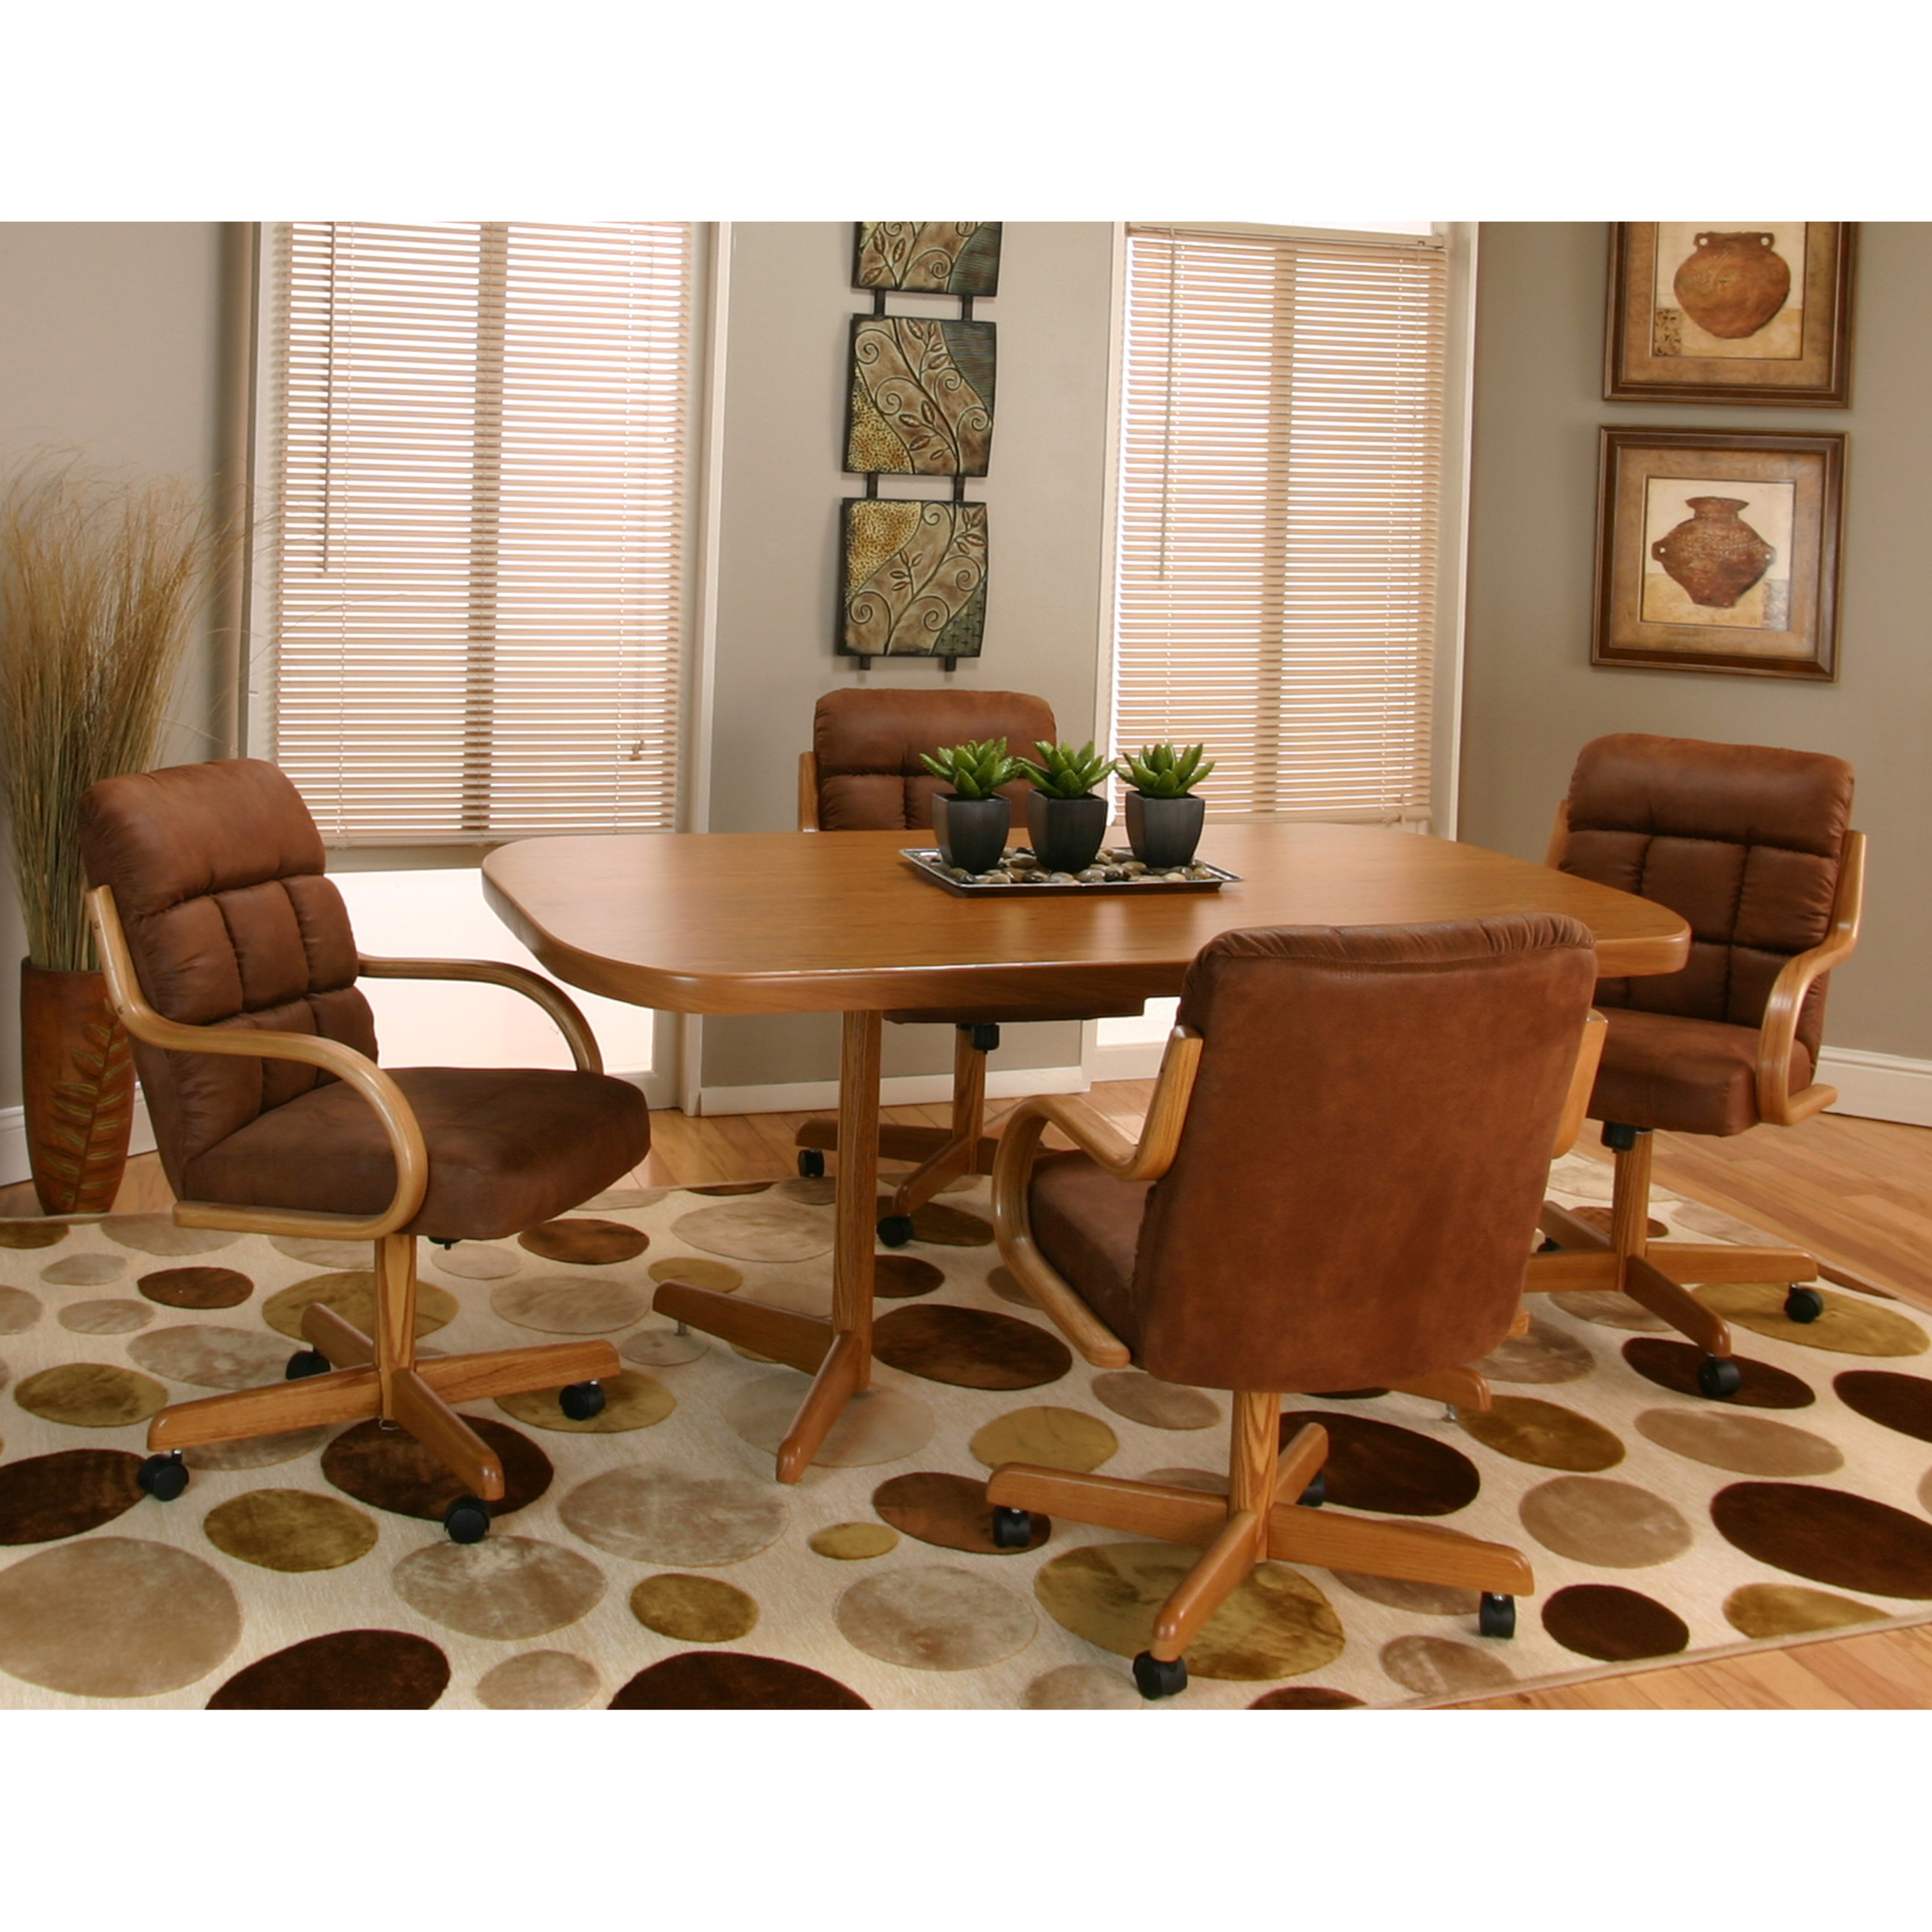 Laminate kitchen table sets  sc 1 st  Foter & Laminate Top Dining Table - Foter